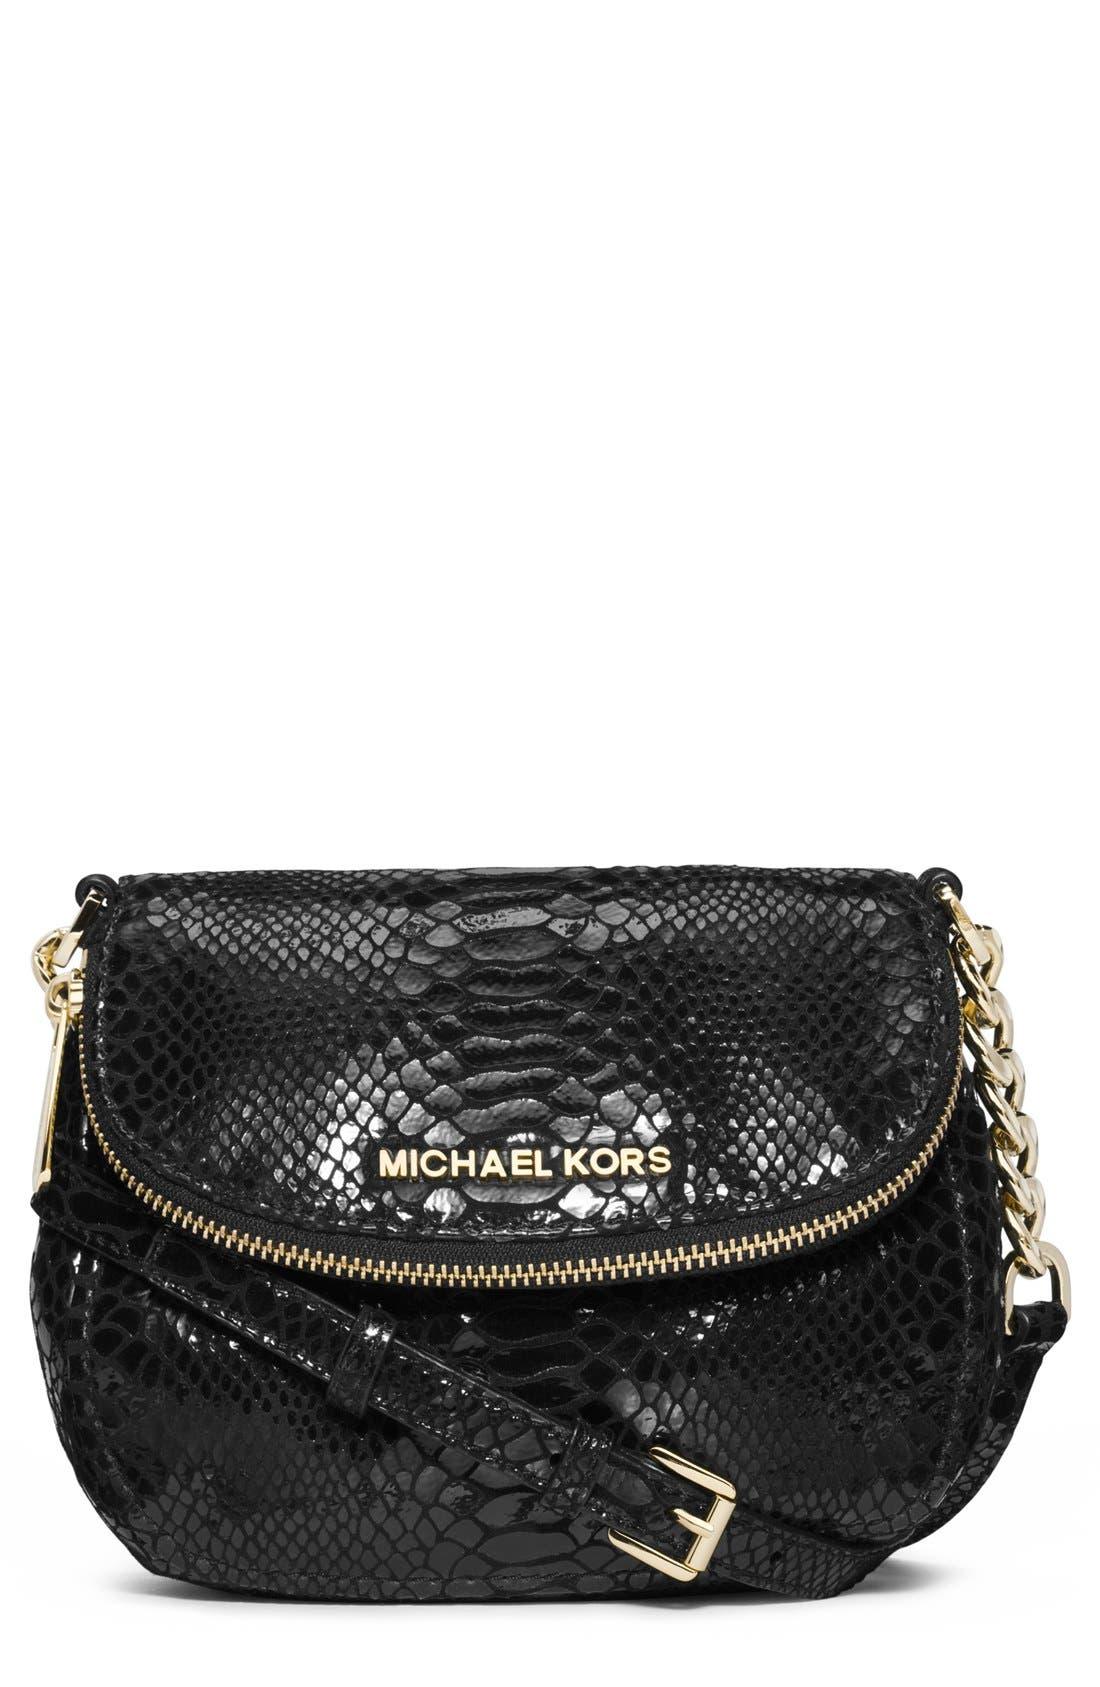 Main Image - MICHAEL Michael Kors 'Bedford' Python Embossed Leather Crossbody Bag